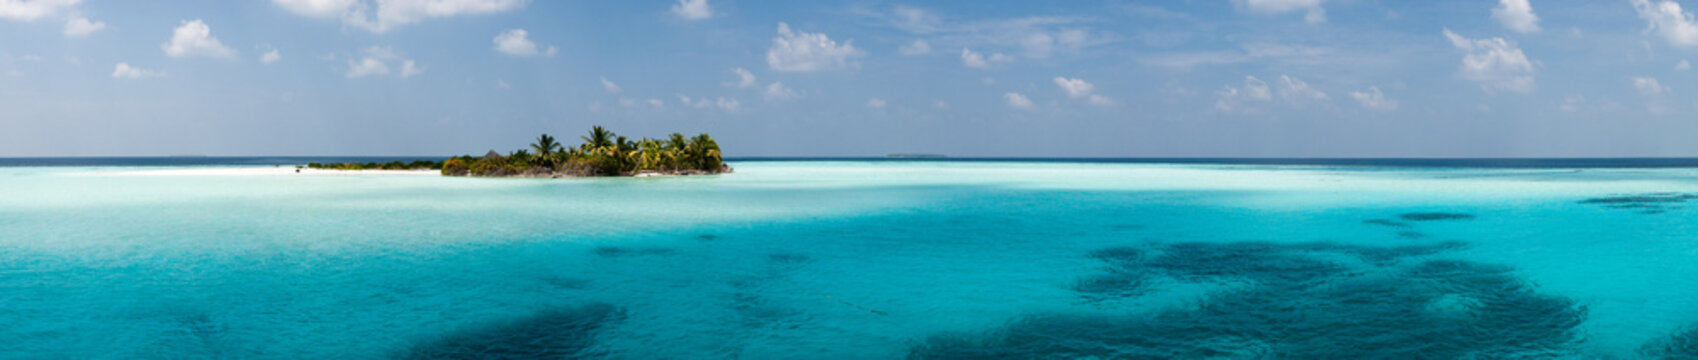 Maldives - Panorama de l'île d'Hamza